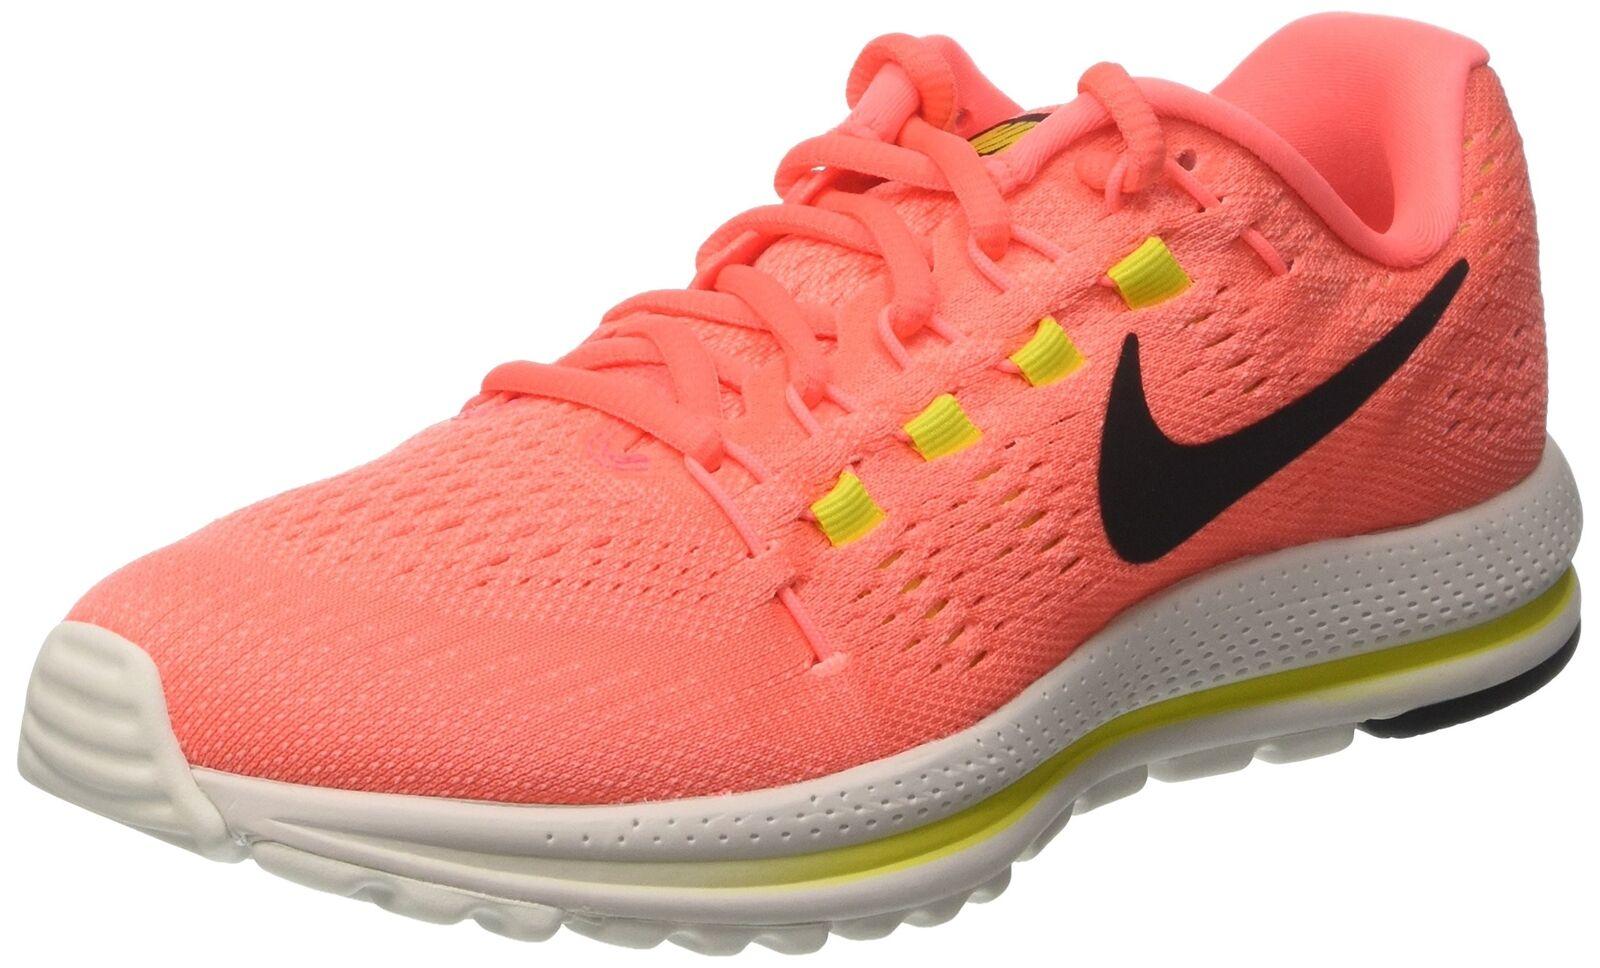 NIKE Womens Air Zoom Vomero 12 Running Shoe, Hot Punch/Black/Lava Glow/Electr...